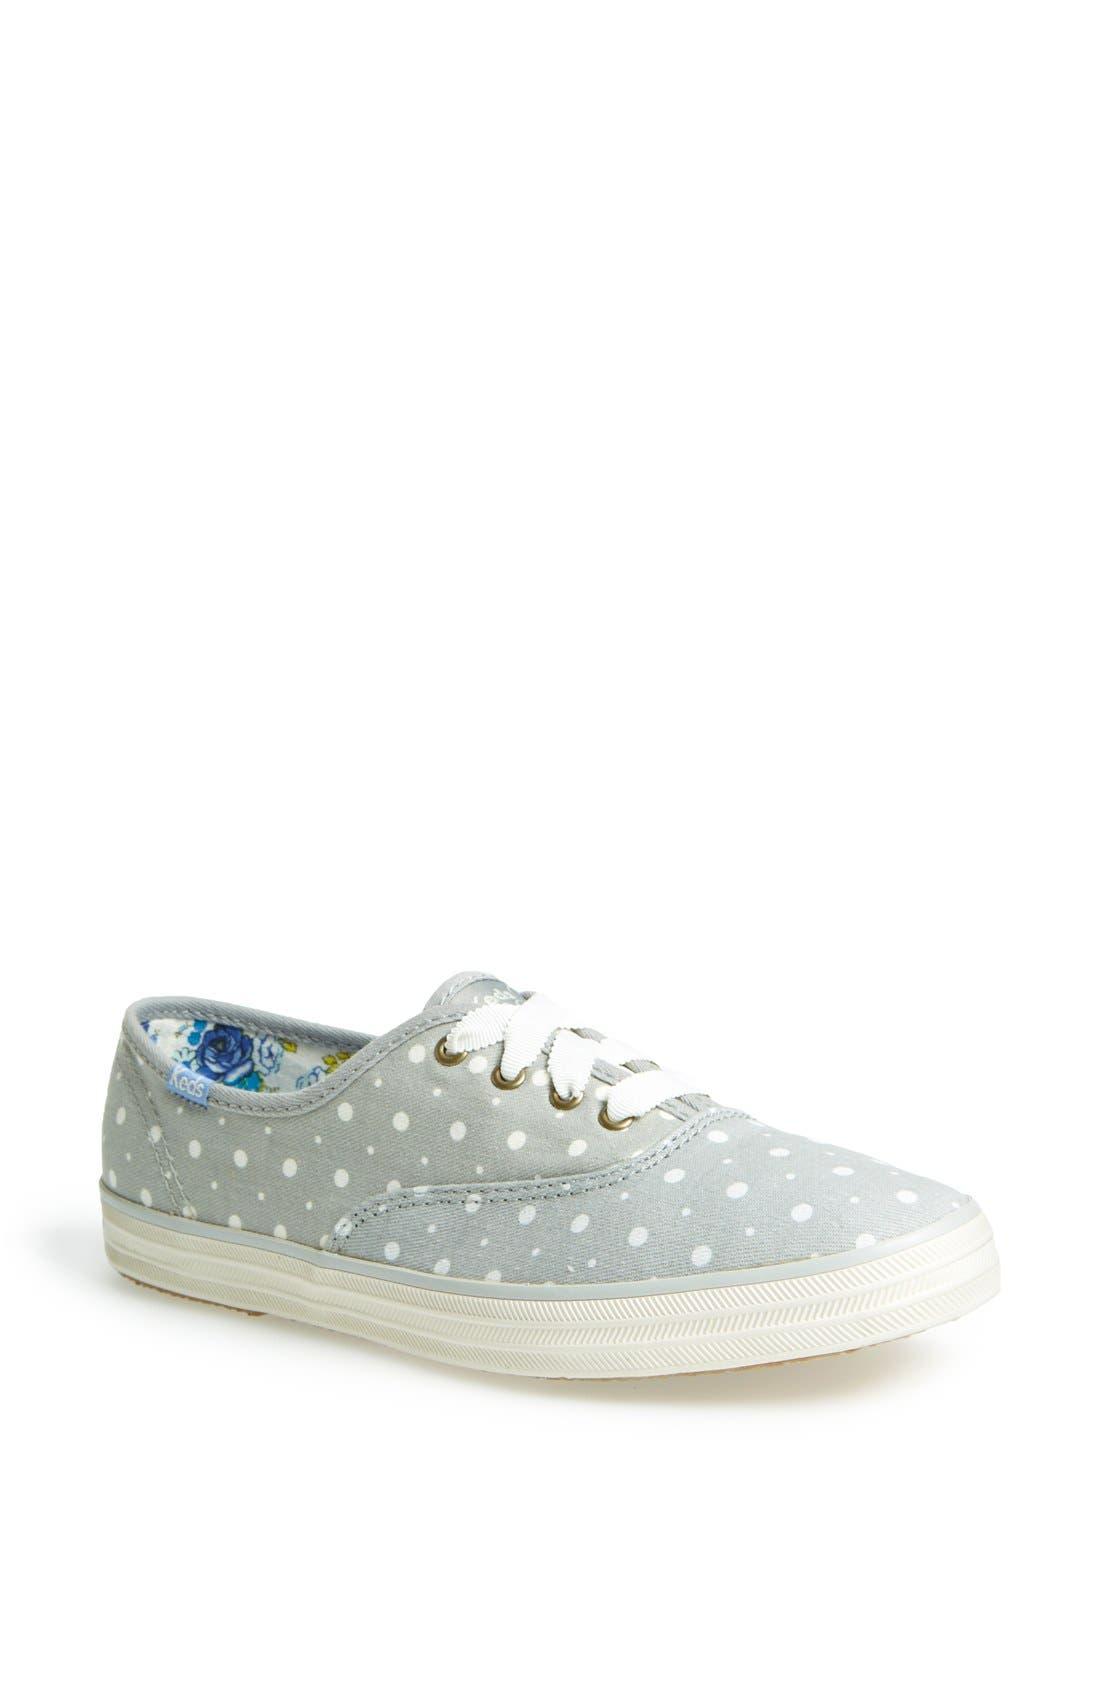 Main Image - Keds® Taylor Swift Polka Dot Sneaker (Women)